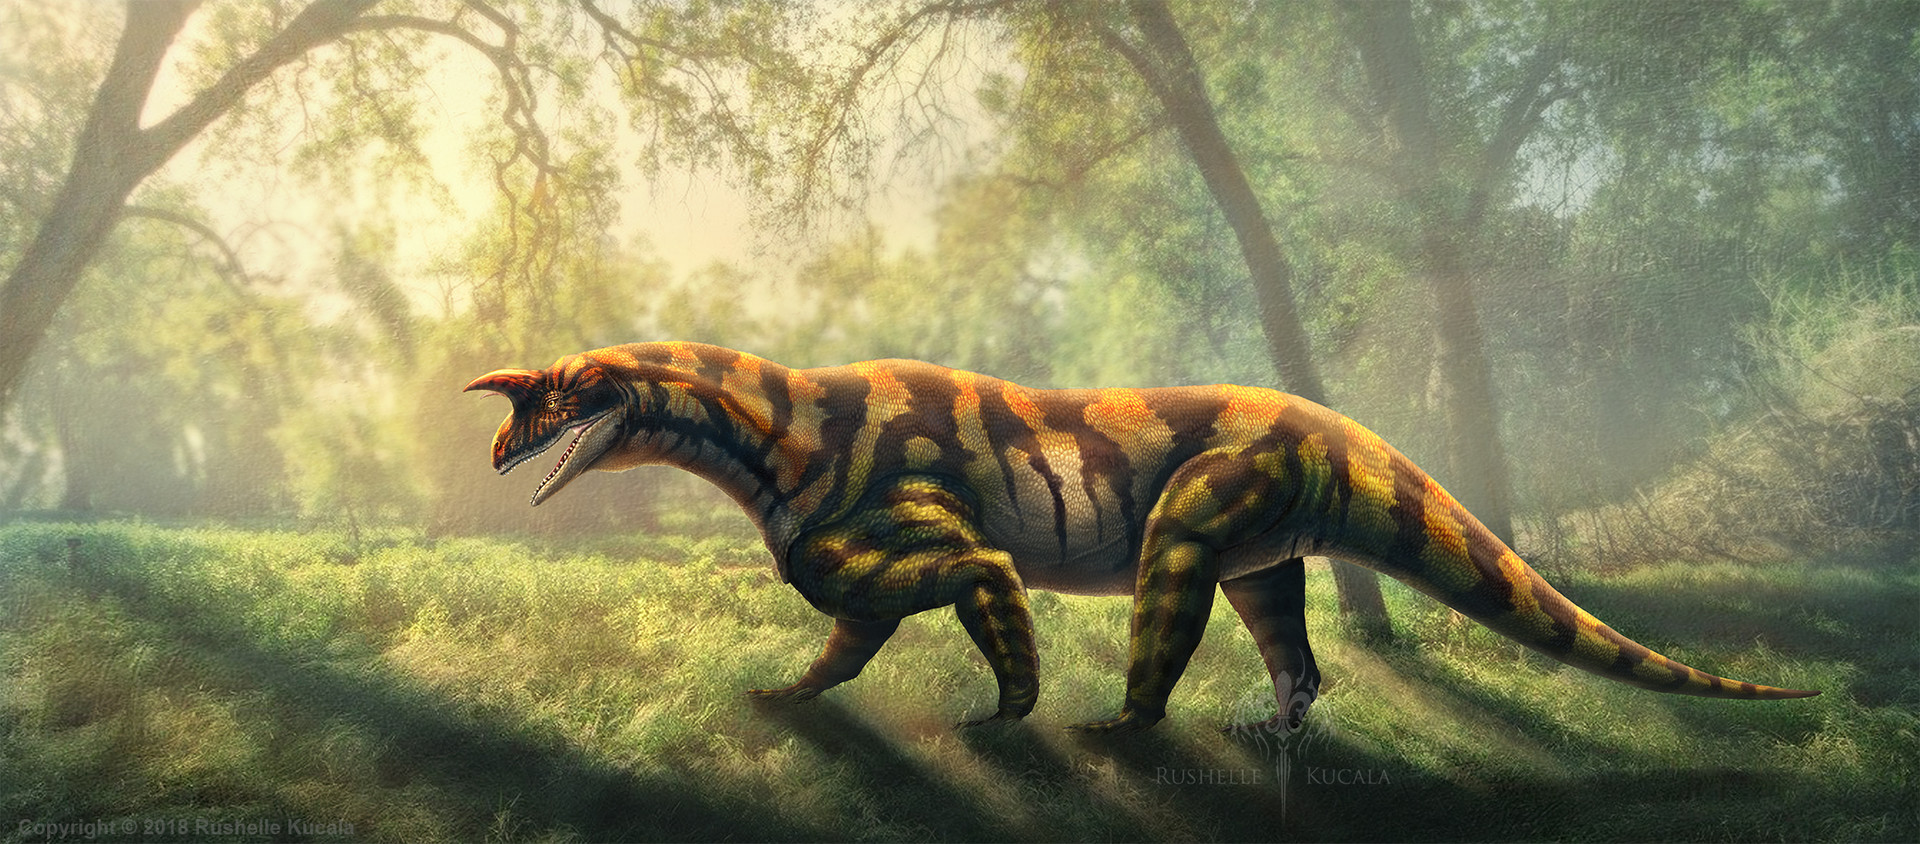 rushelle-kucala-shringasaurusindicusrest